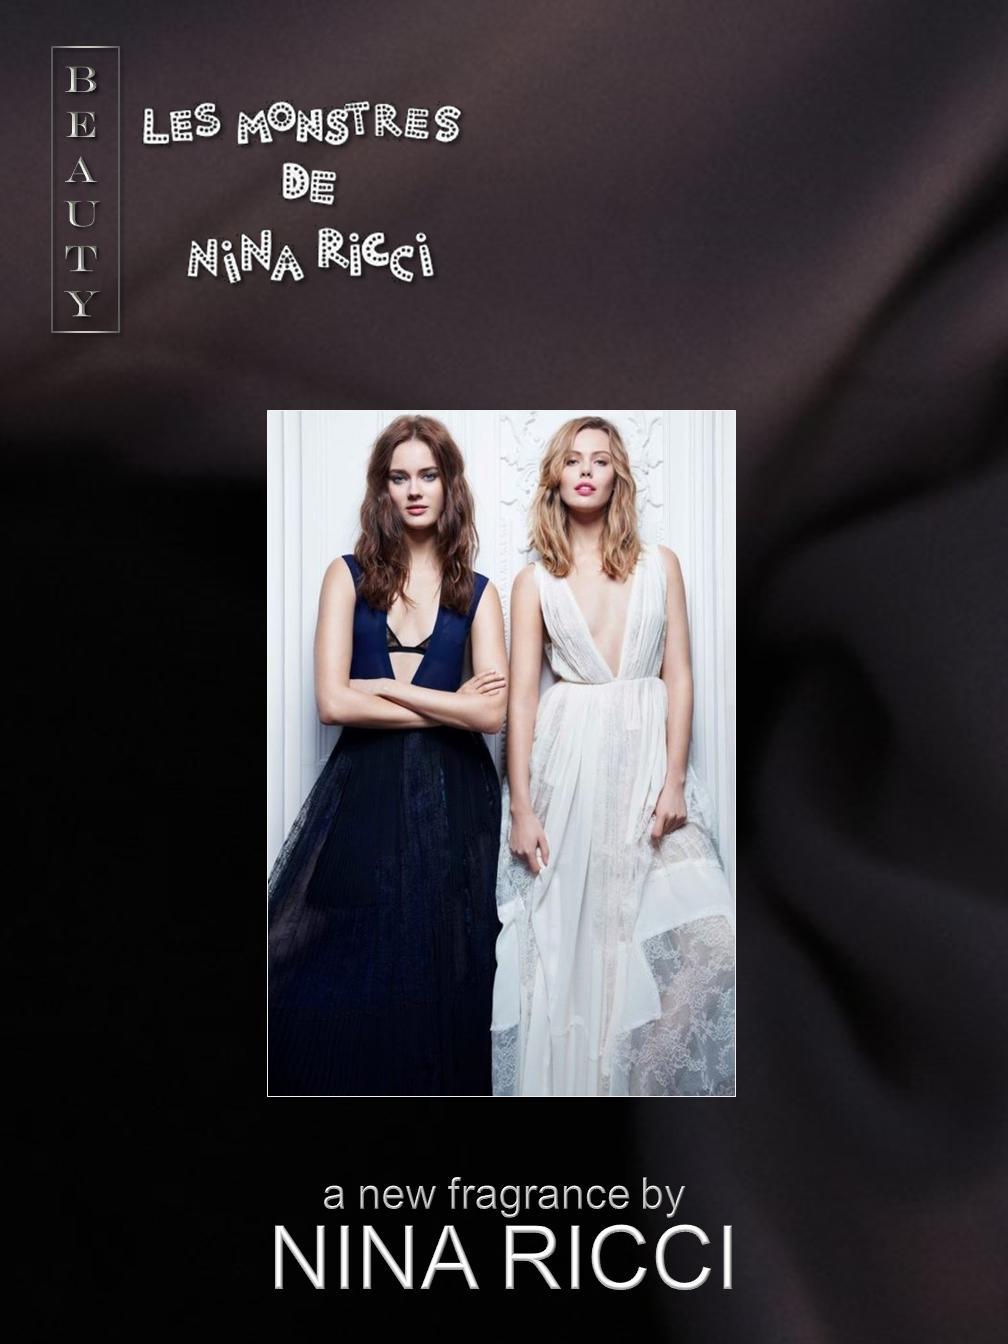 Nina Ricci - Les Monstres